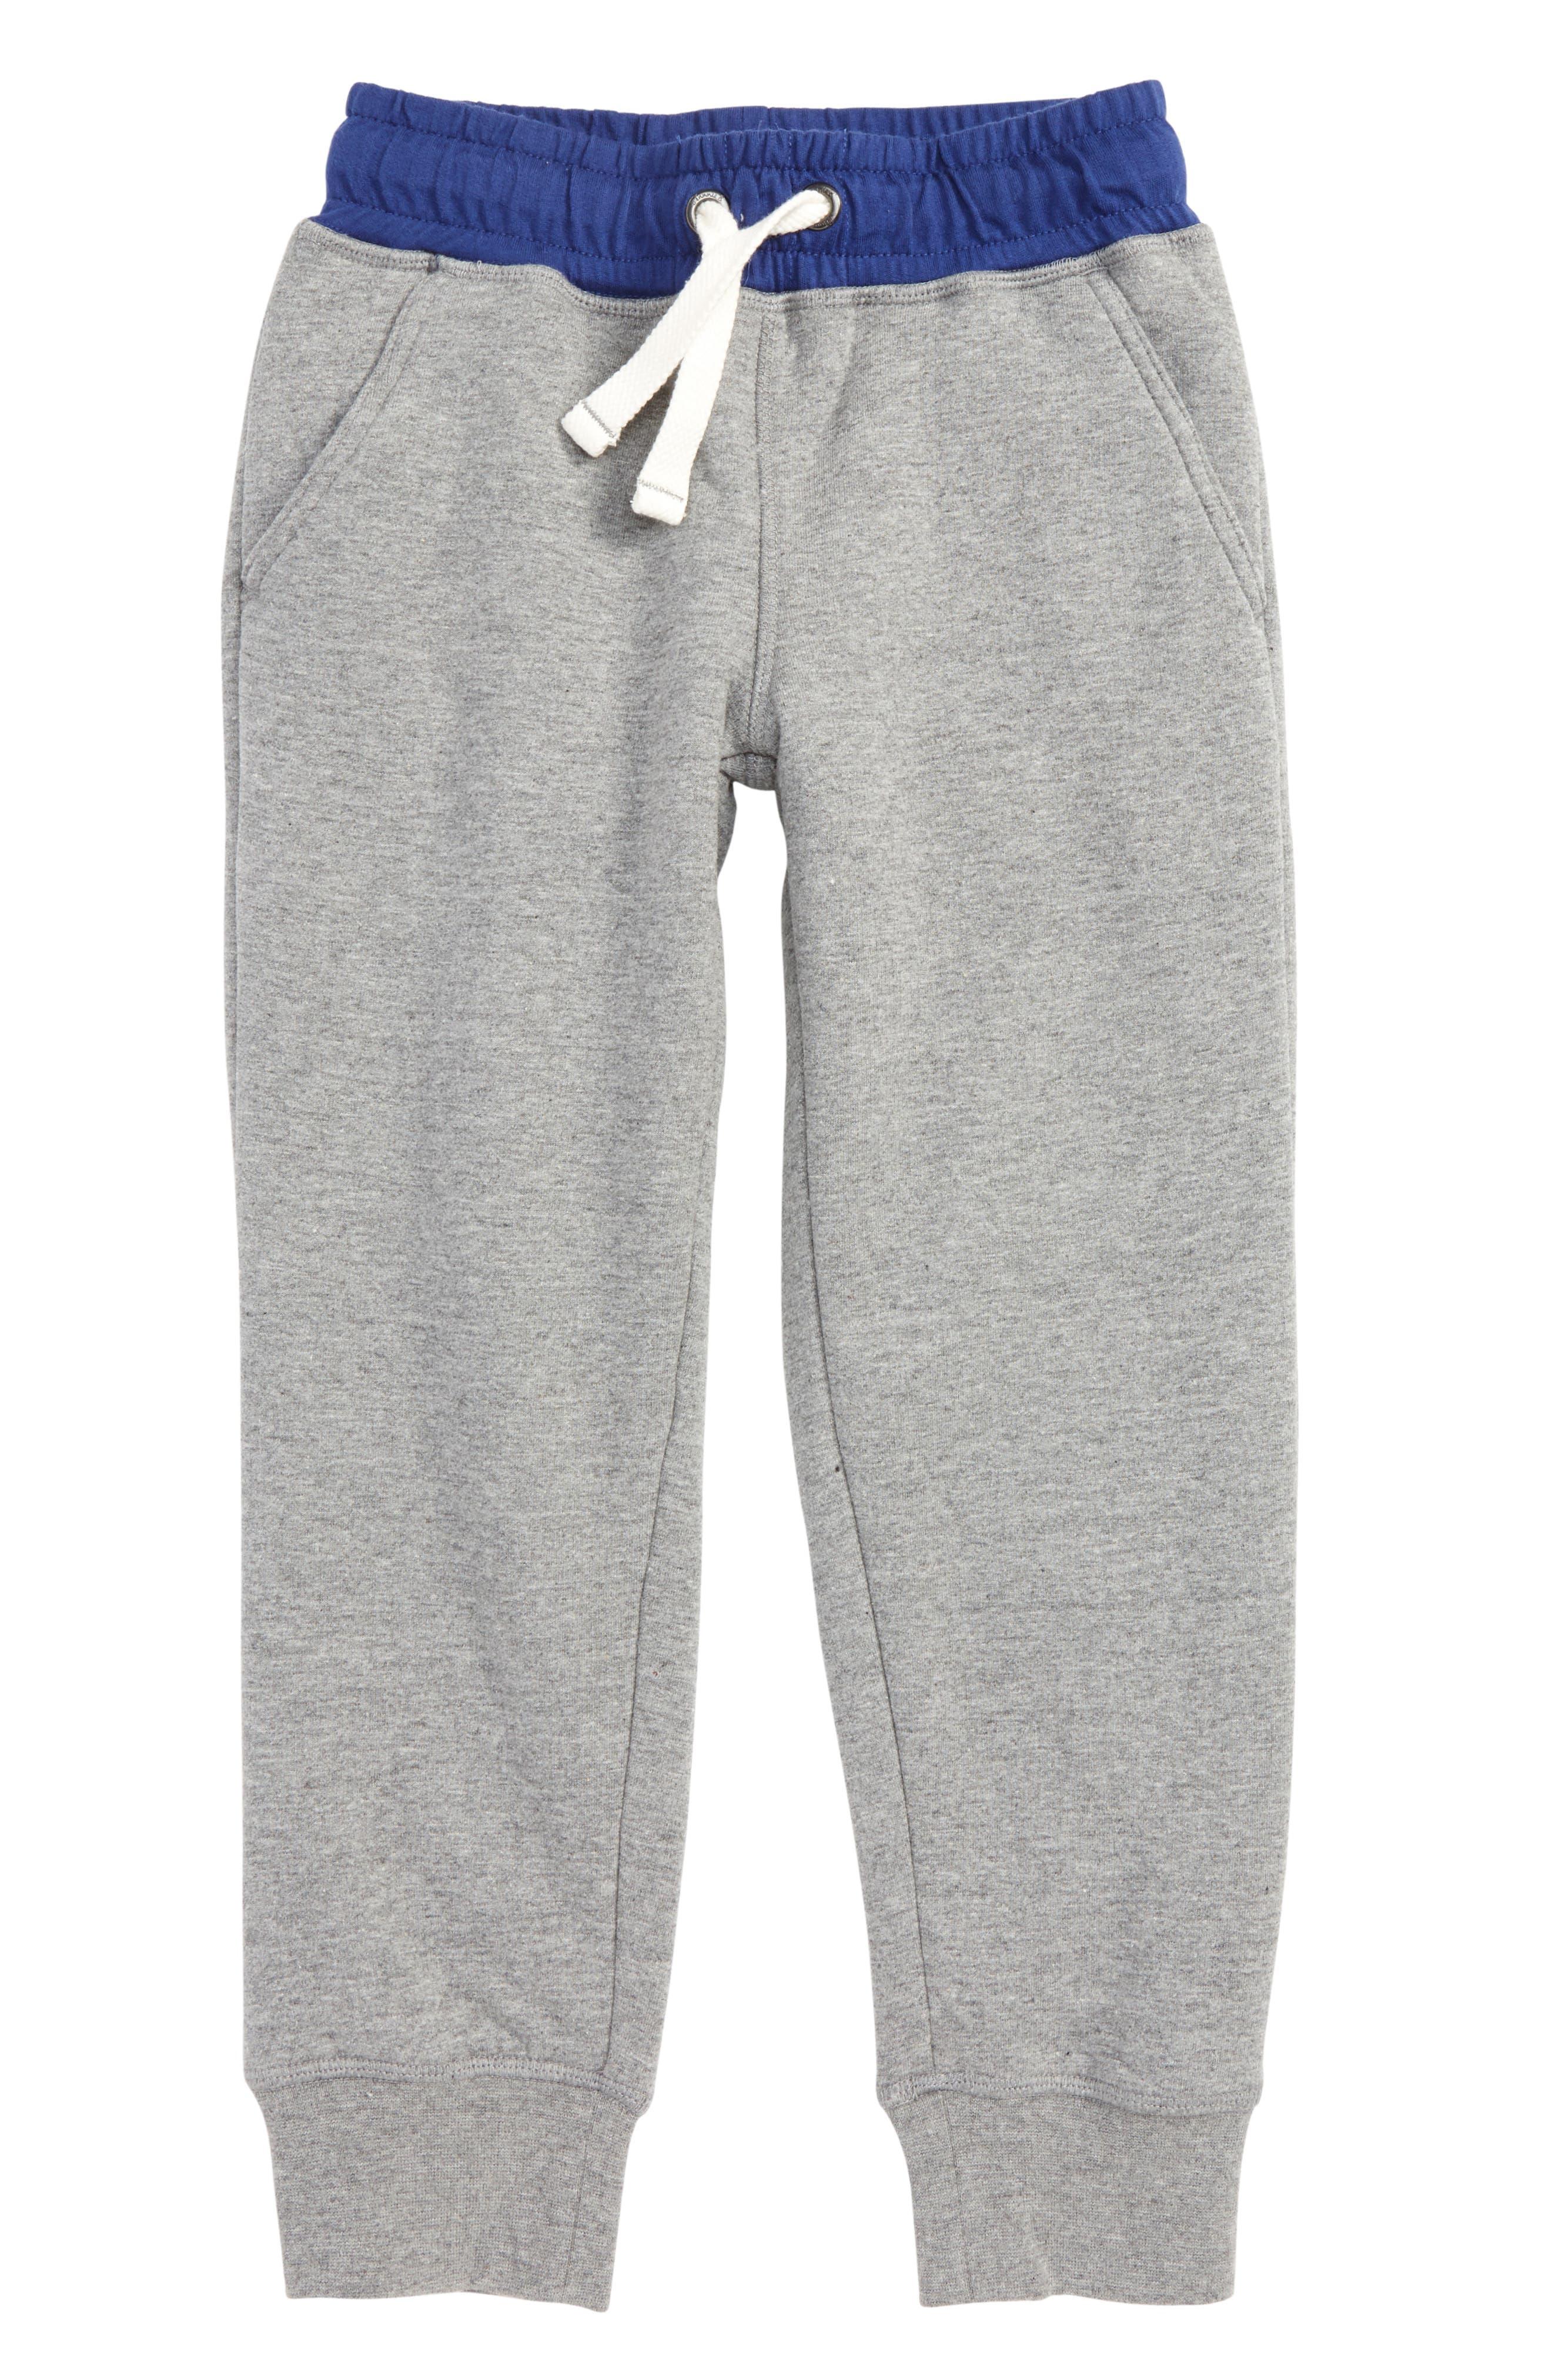 Main Image - Mini Boden Shaggy Jogger Pants (Little Boys & Big Boys)